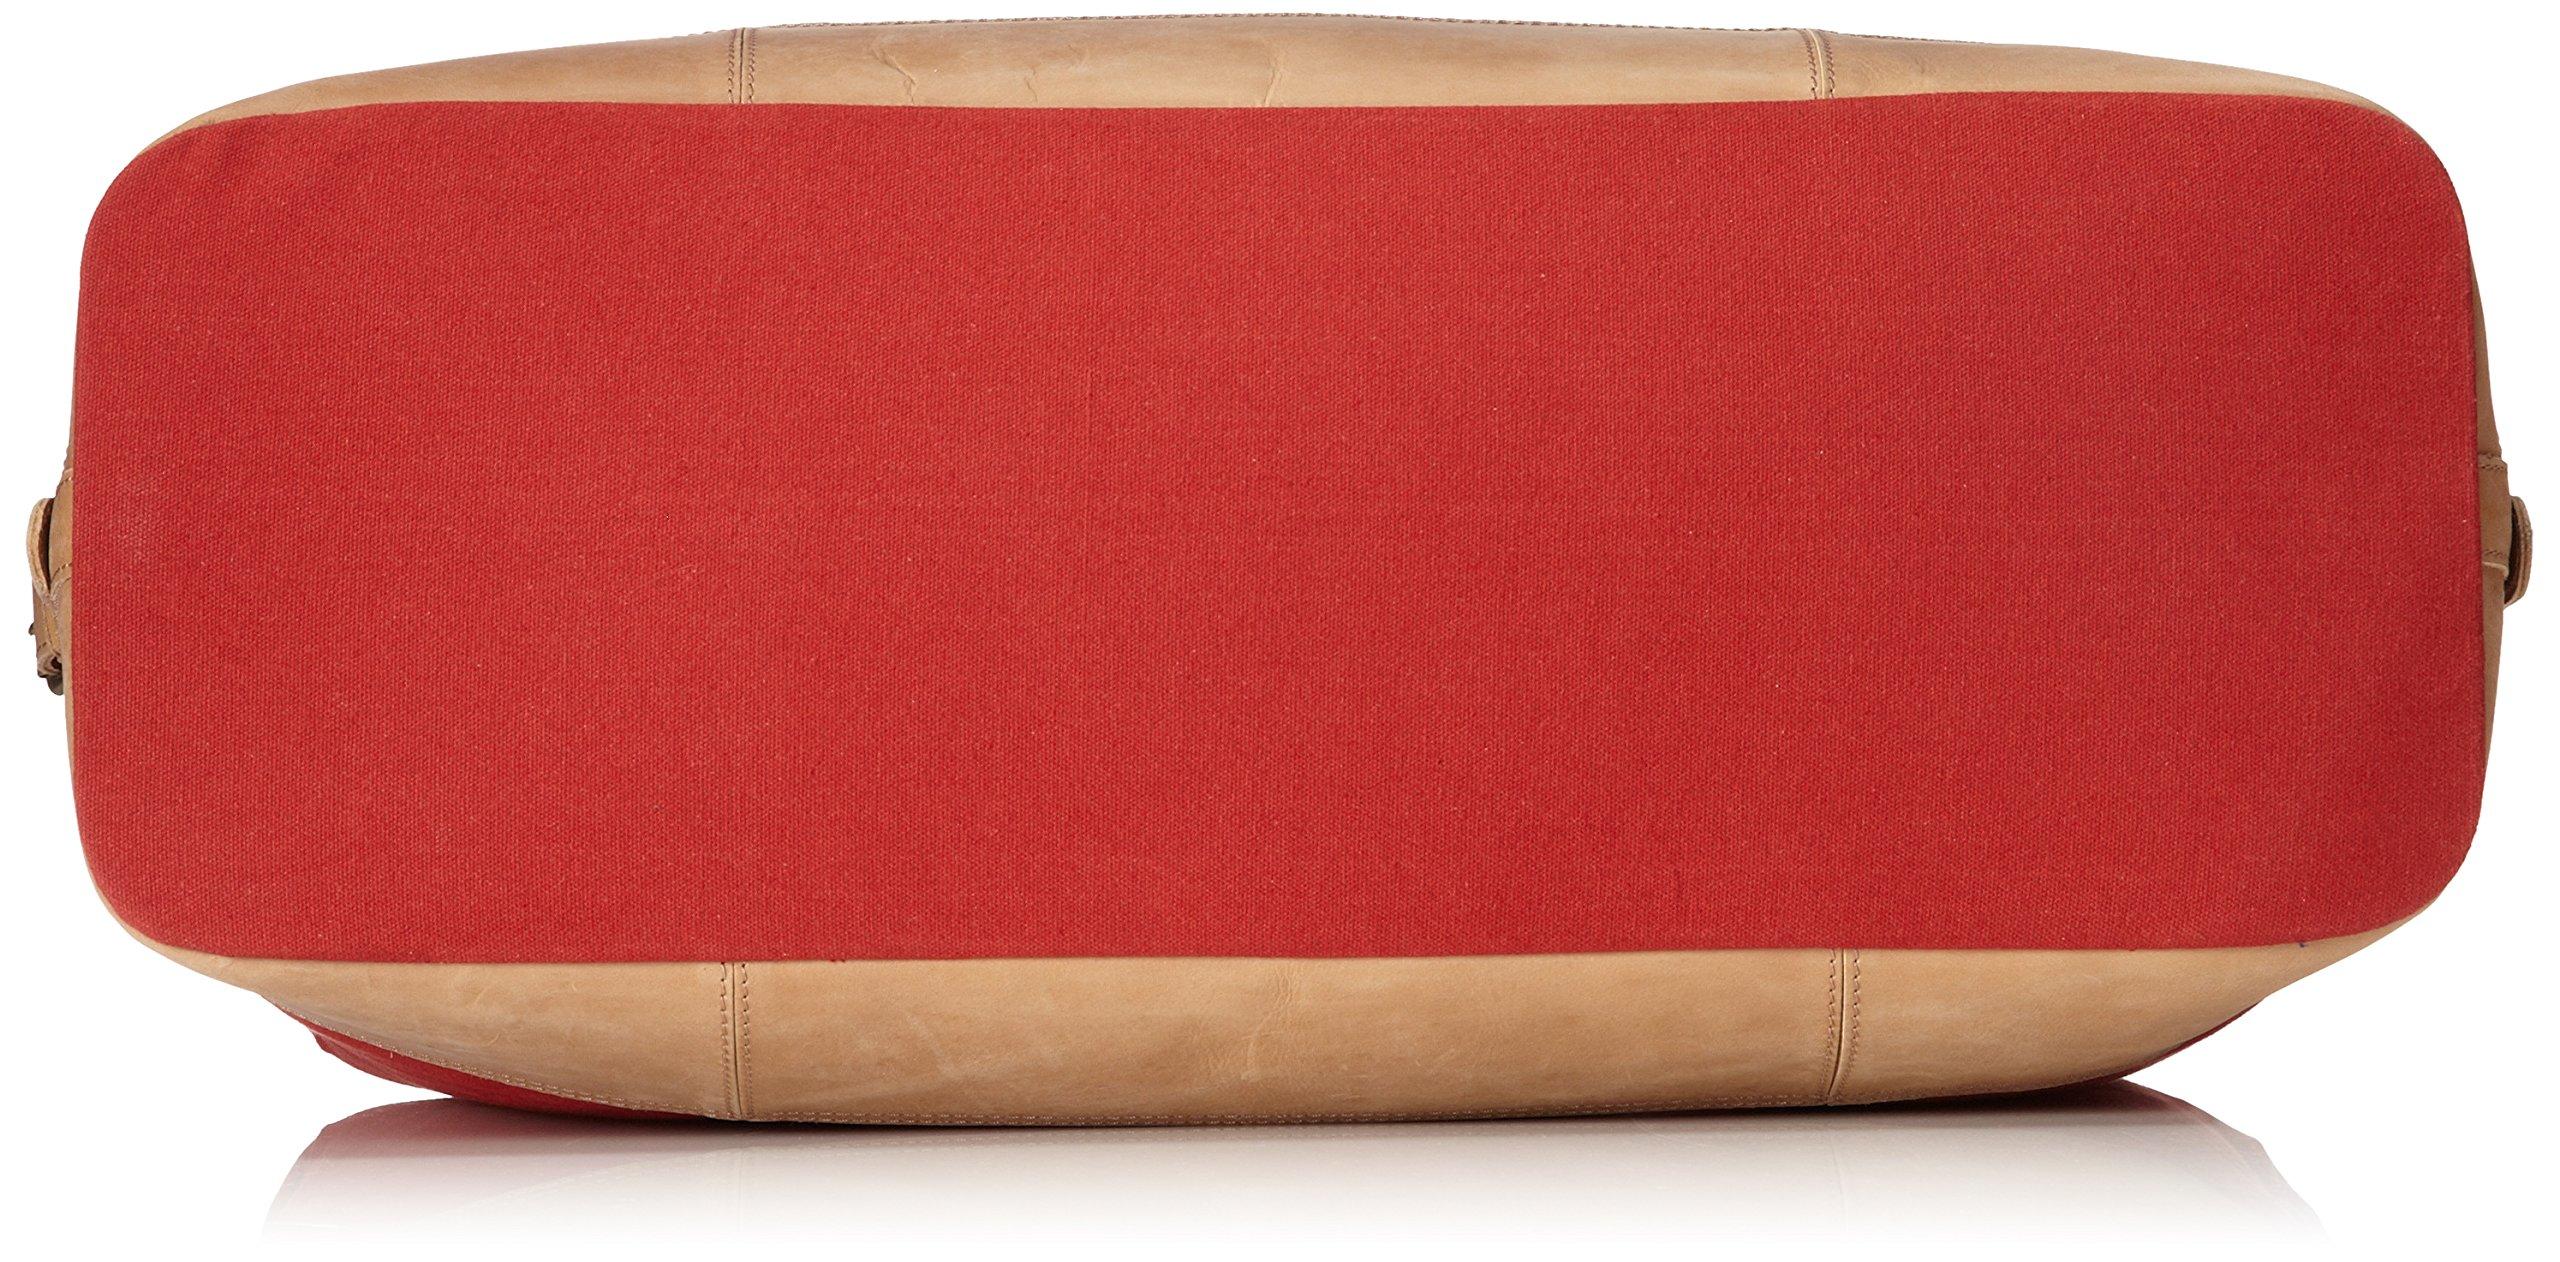 Original Penguin Men's Canvas Weekend Bag Duffel Bag, Pompeian Red, One Size by Original Penguin (Image #4)